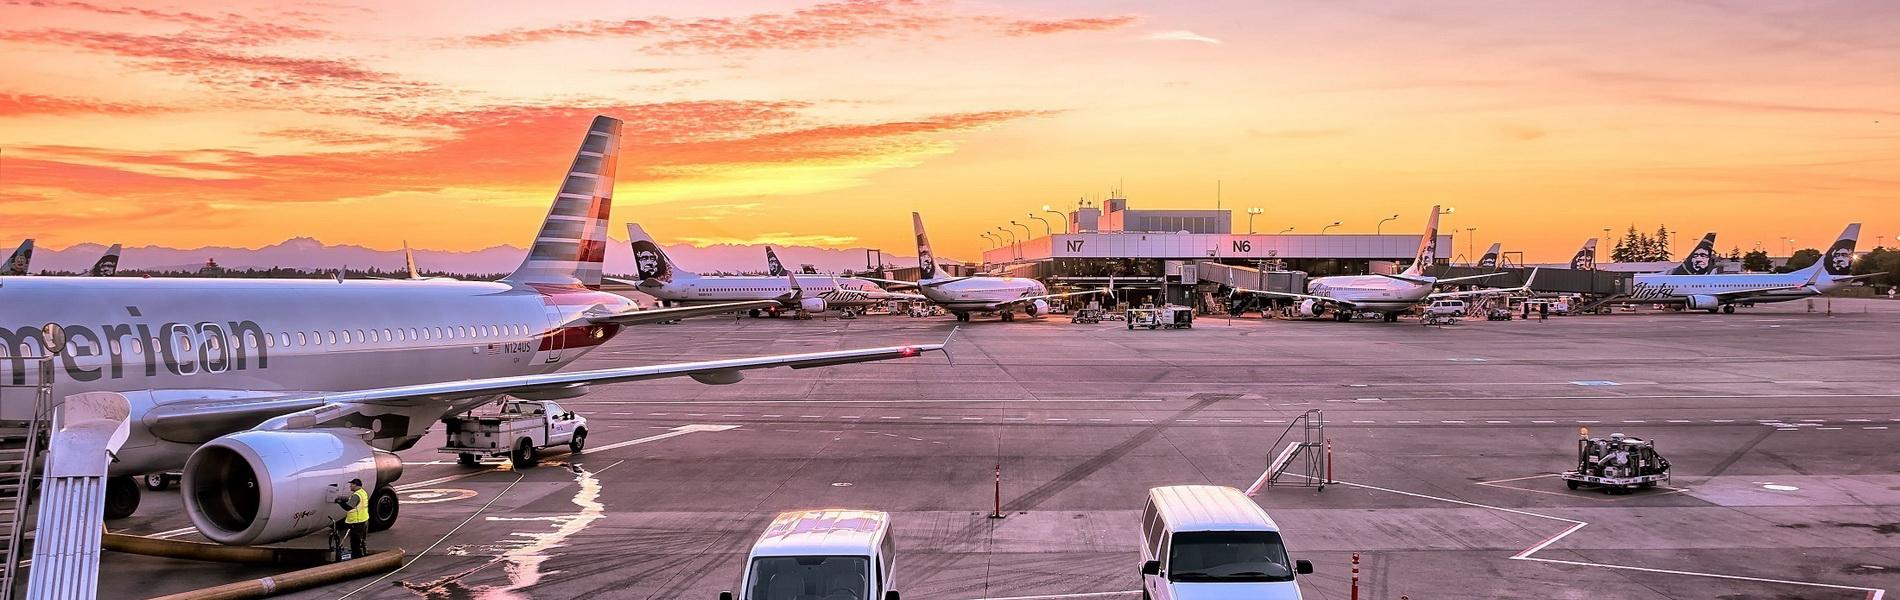 Angedockte Flugzeuge am Flughafen, CC0 Creative Commons